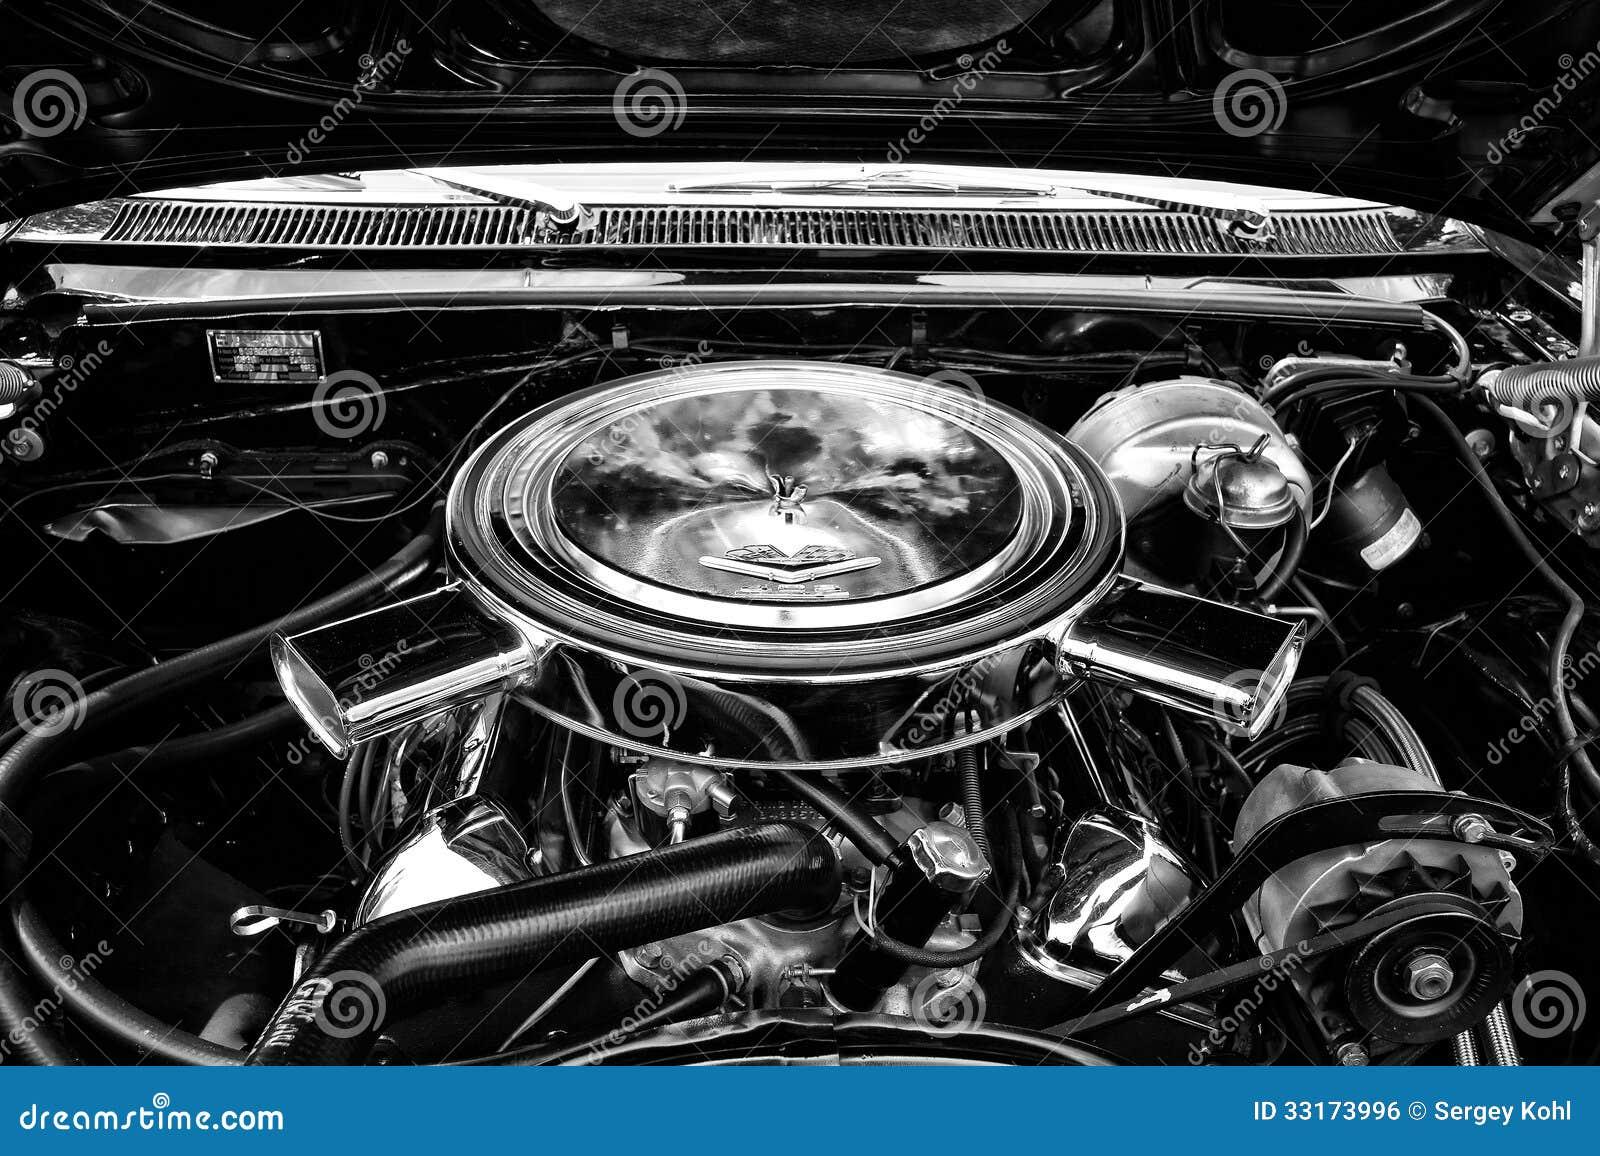 voiture normale chevrolet impala solides solubles de moteur convertible photo ditorial image. Black Bedroom Furniture Sets. Home Design Ideas